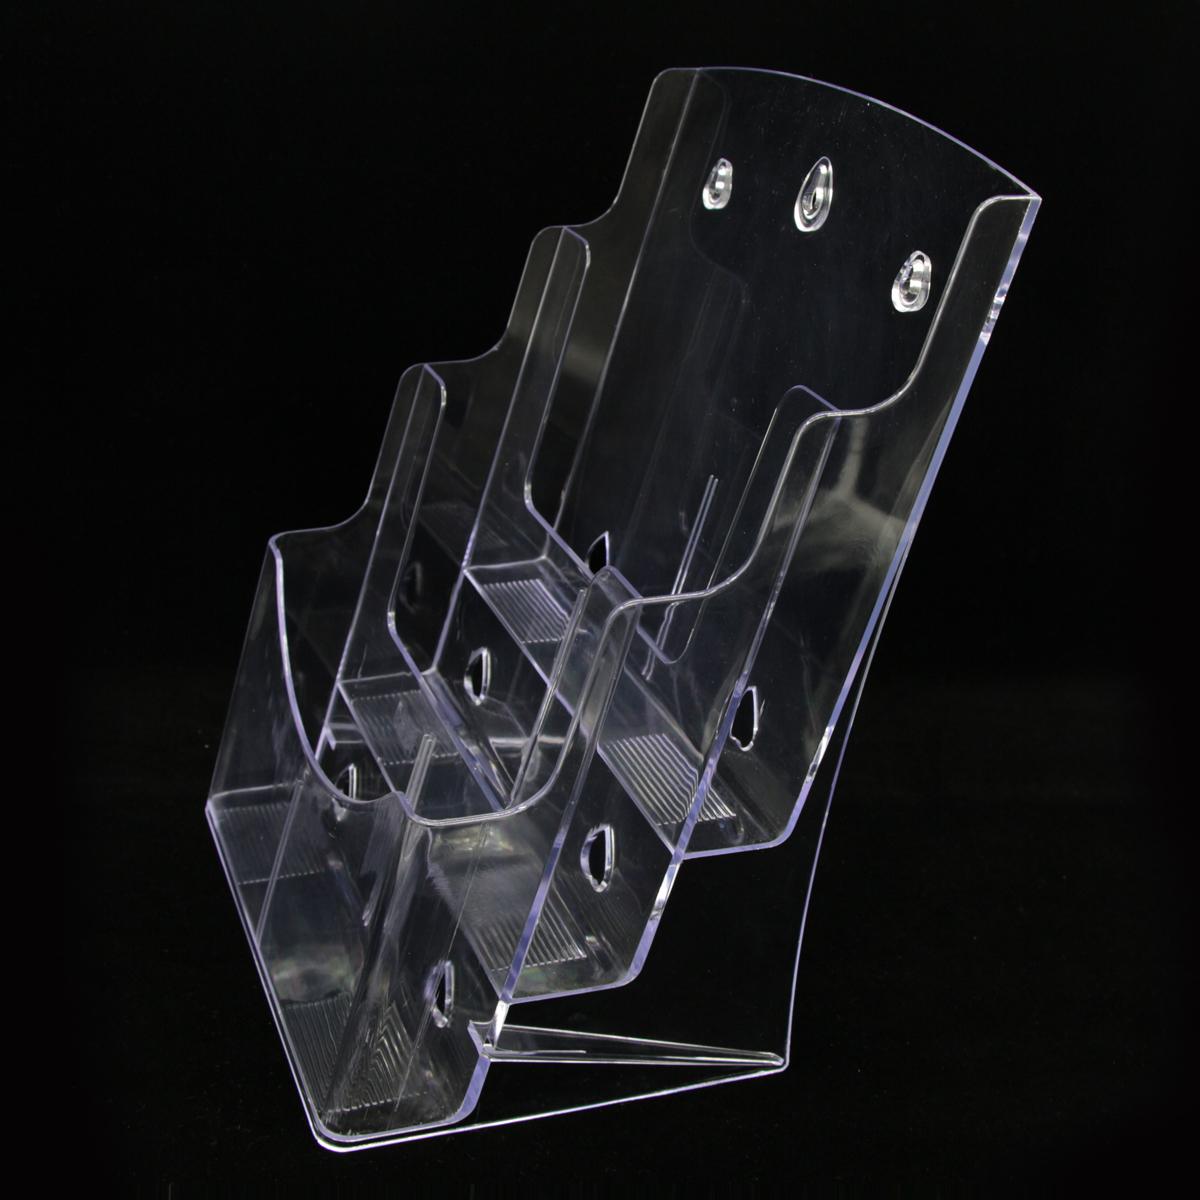 a4亚克力三层资料架盒宣传册展示架透明桌面目录彩页折页传单架子